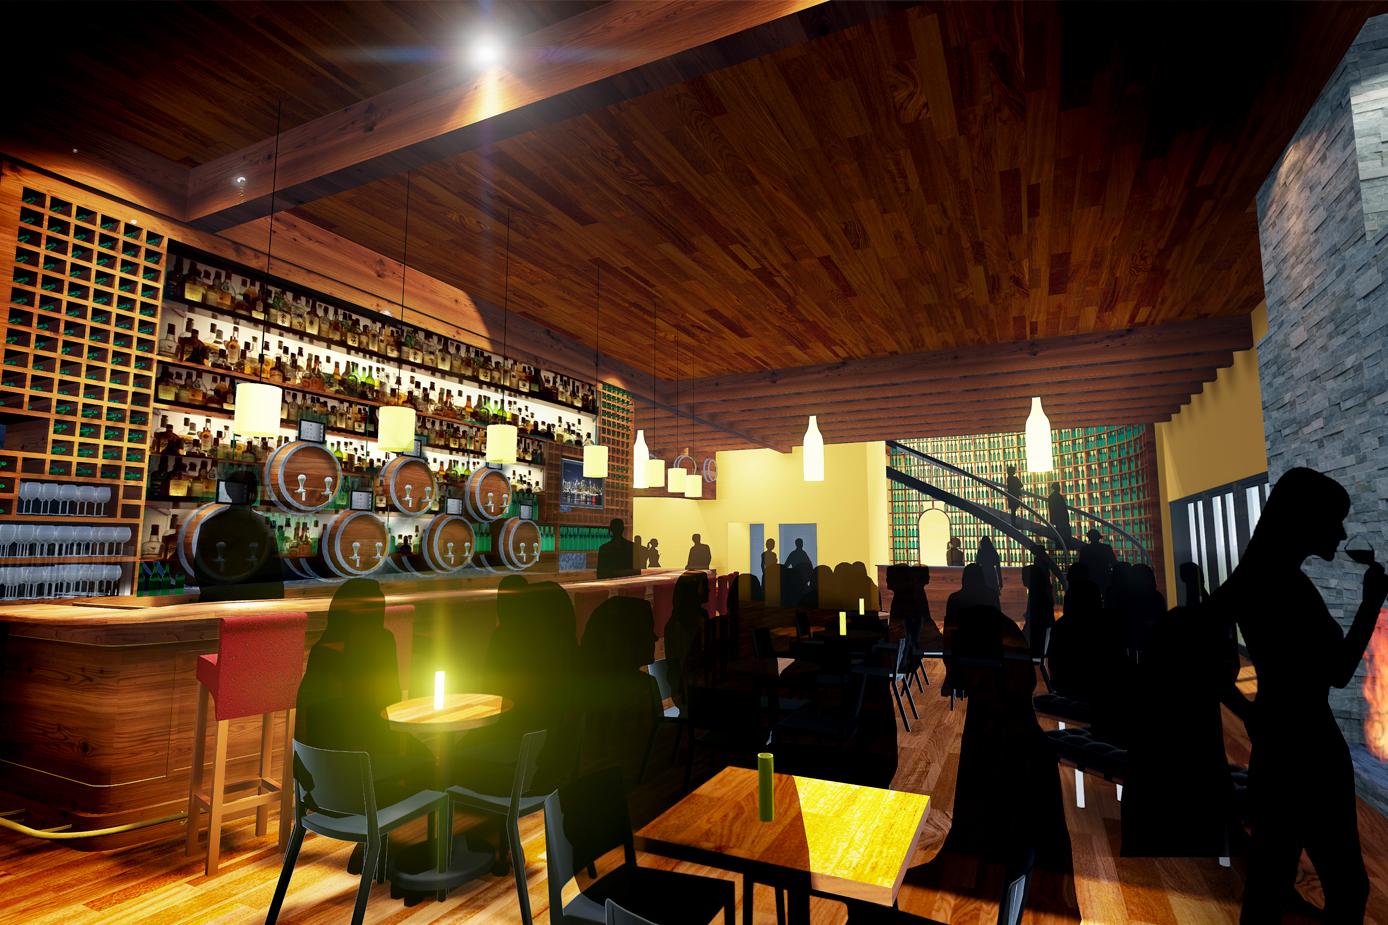 City Winery - Nashville Renderings \u2014 PKPD \u2013 Phillip Katz Project